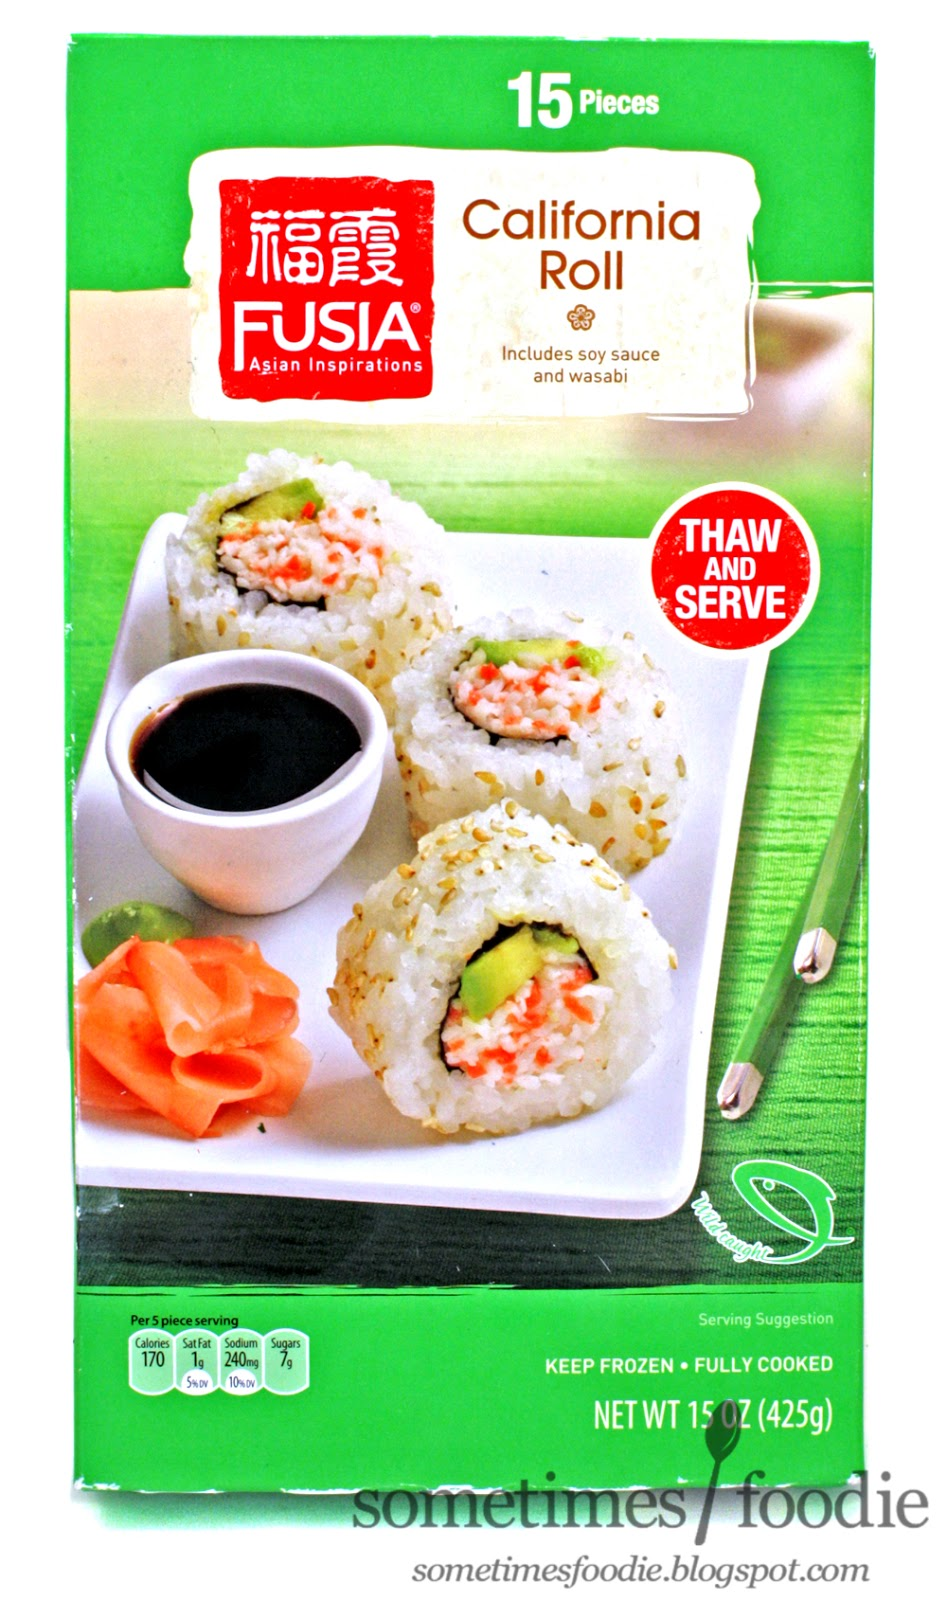 Sometimes foodie fusia frozen california rolls aldi for Frozen fish for sushi